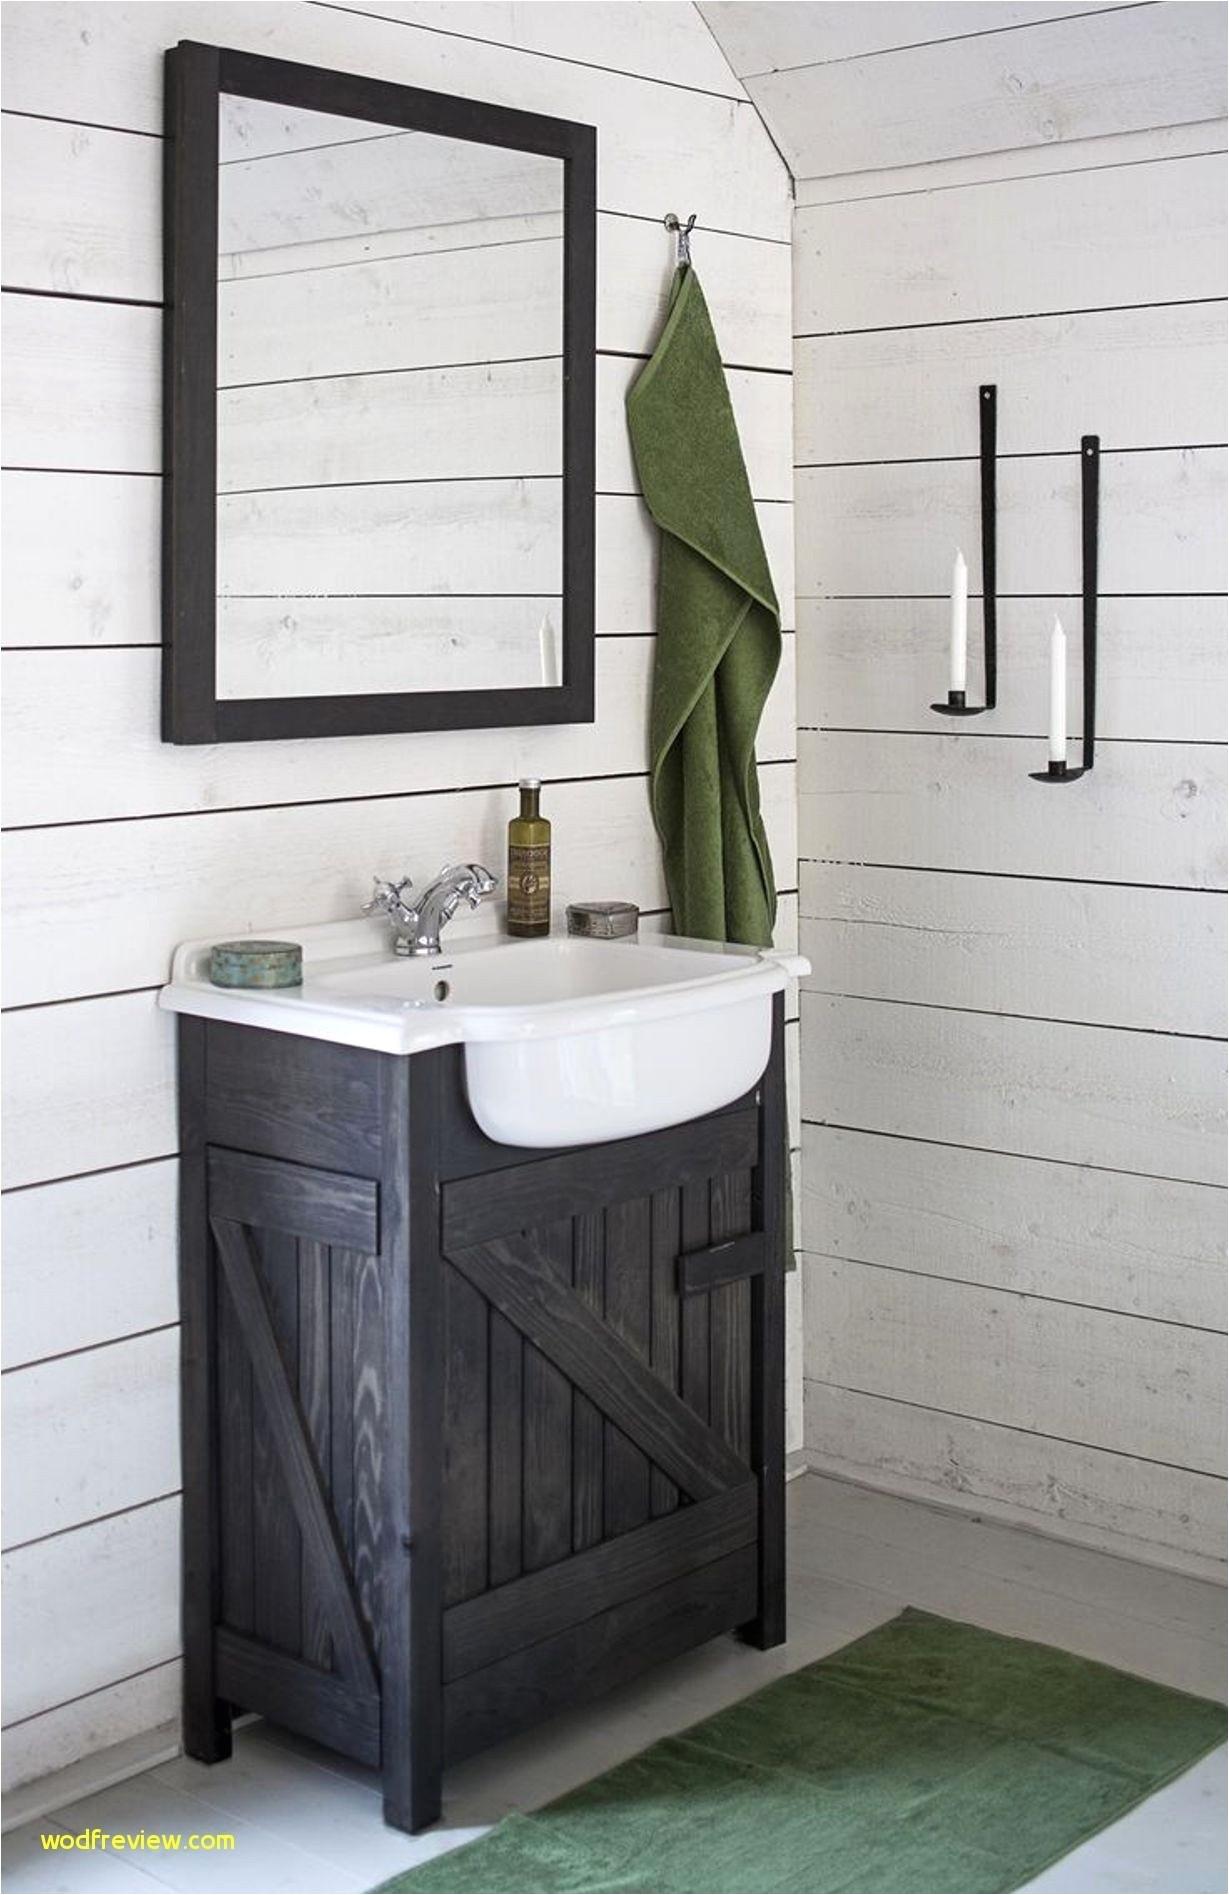 Cool Bathroom Design Ideas Girls Bathroom Design New Inspirational Bathroom Picture Ideas